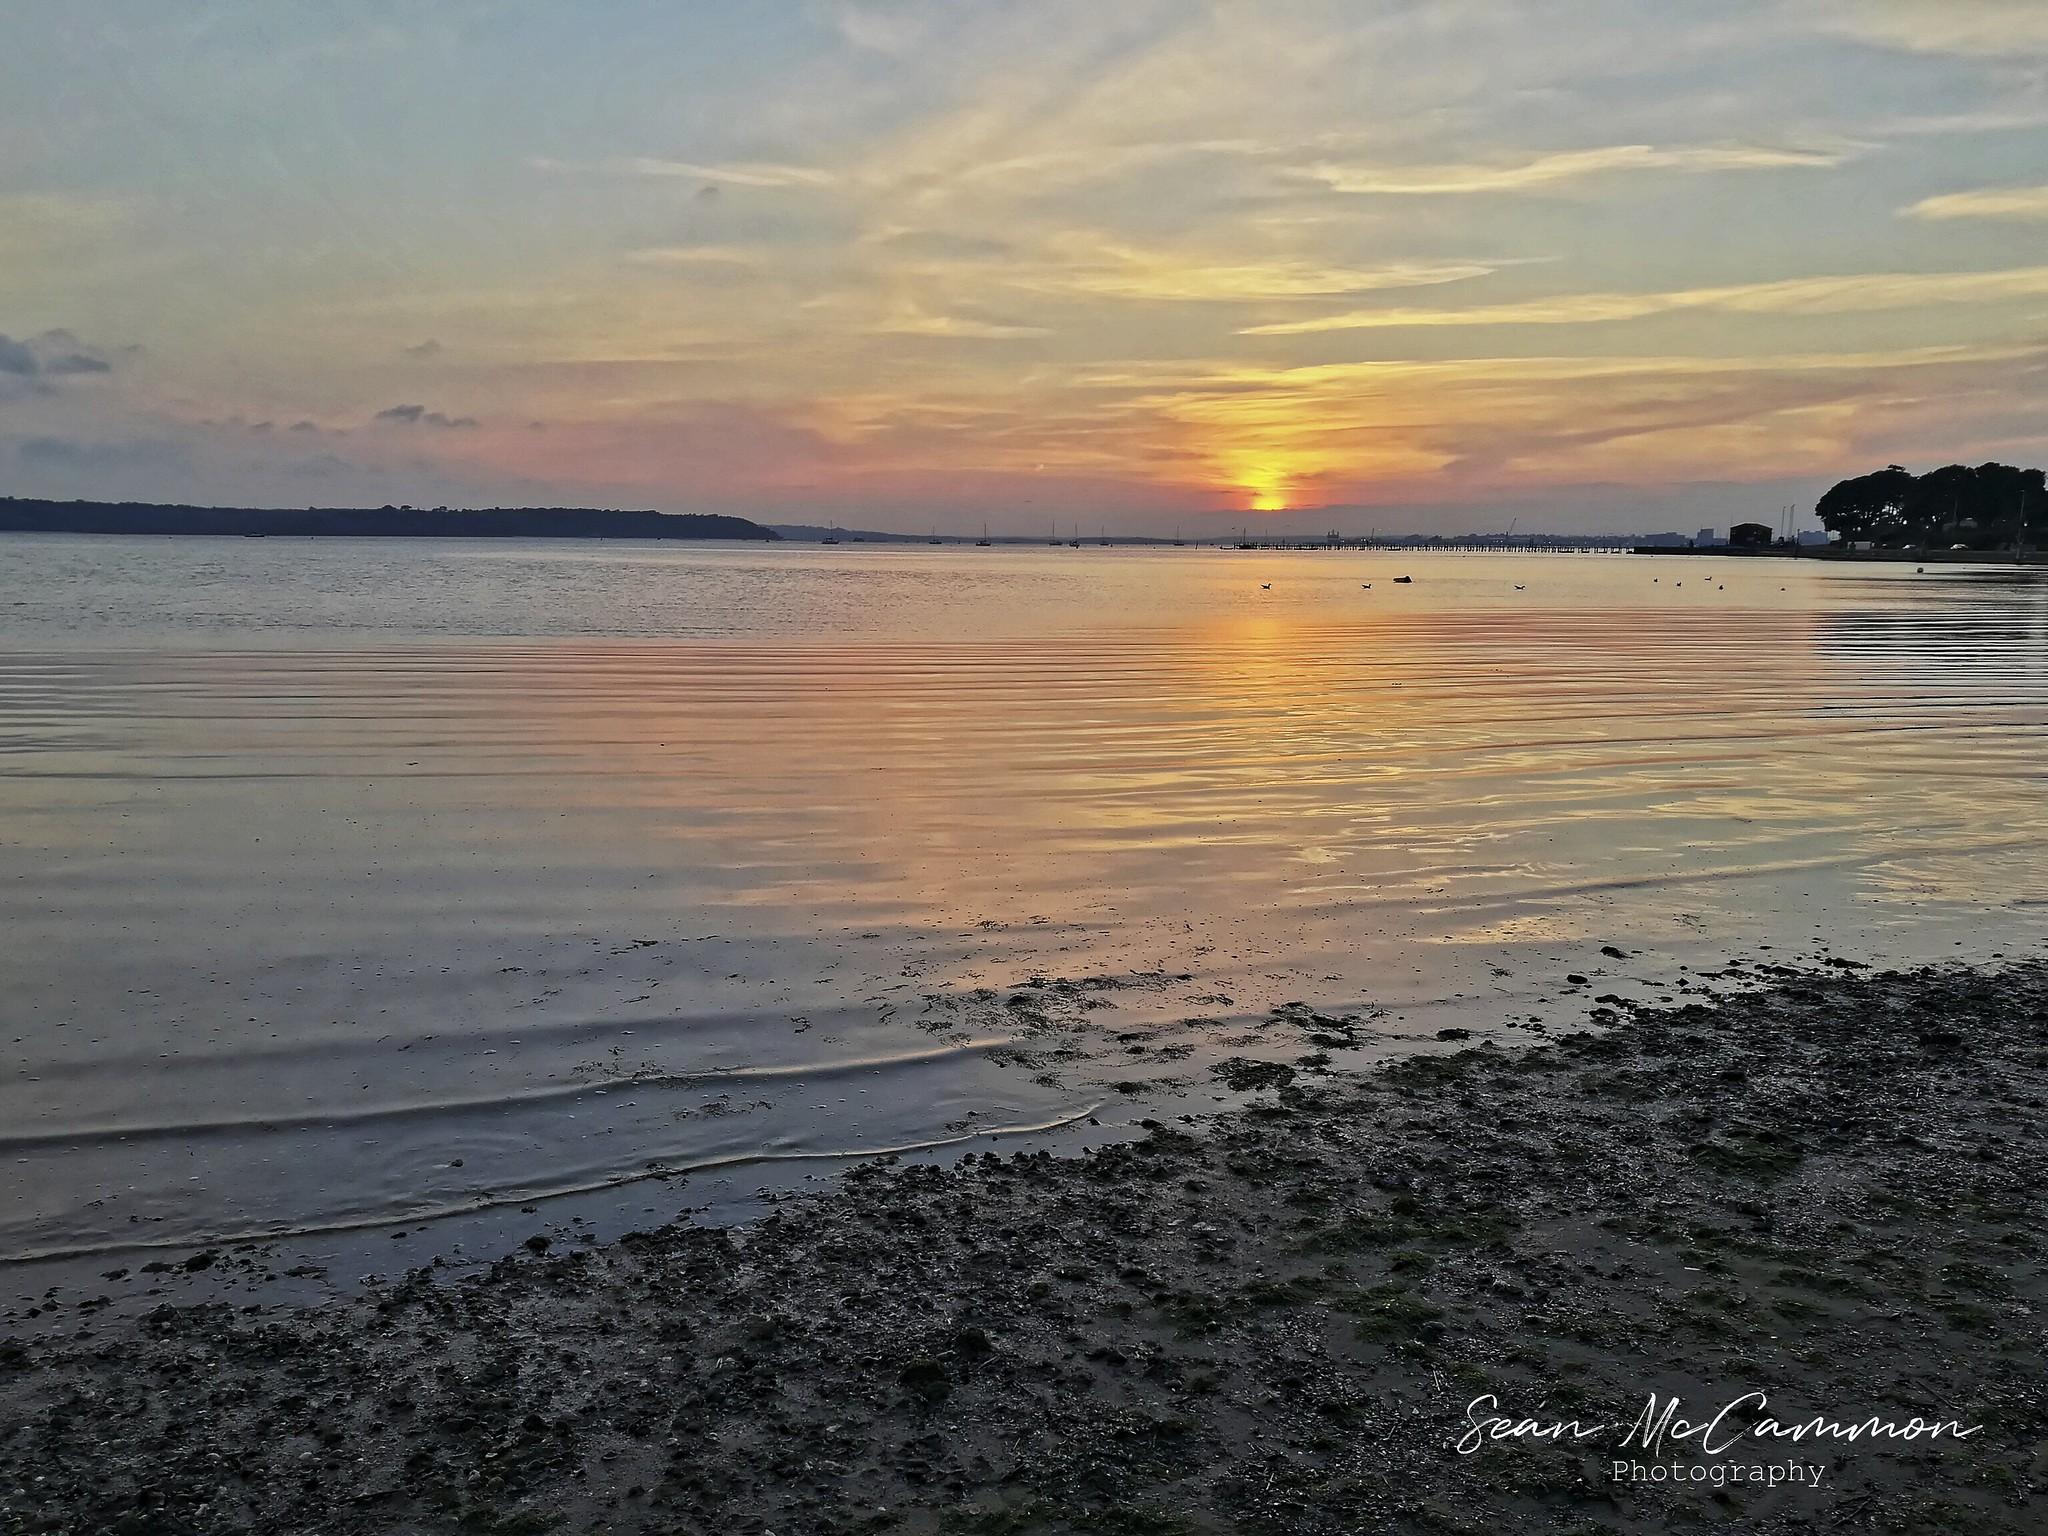 Sandbanks Sunset By Phone